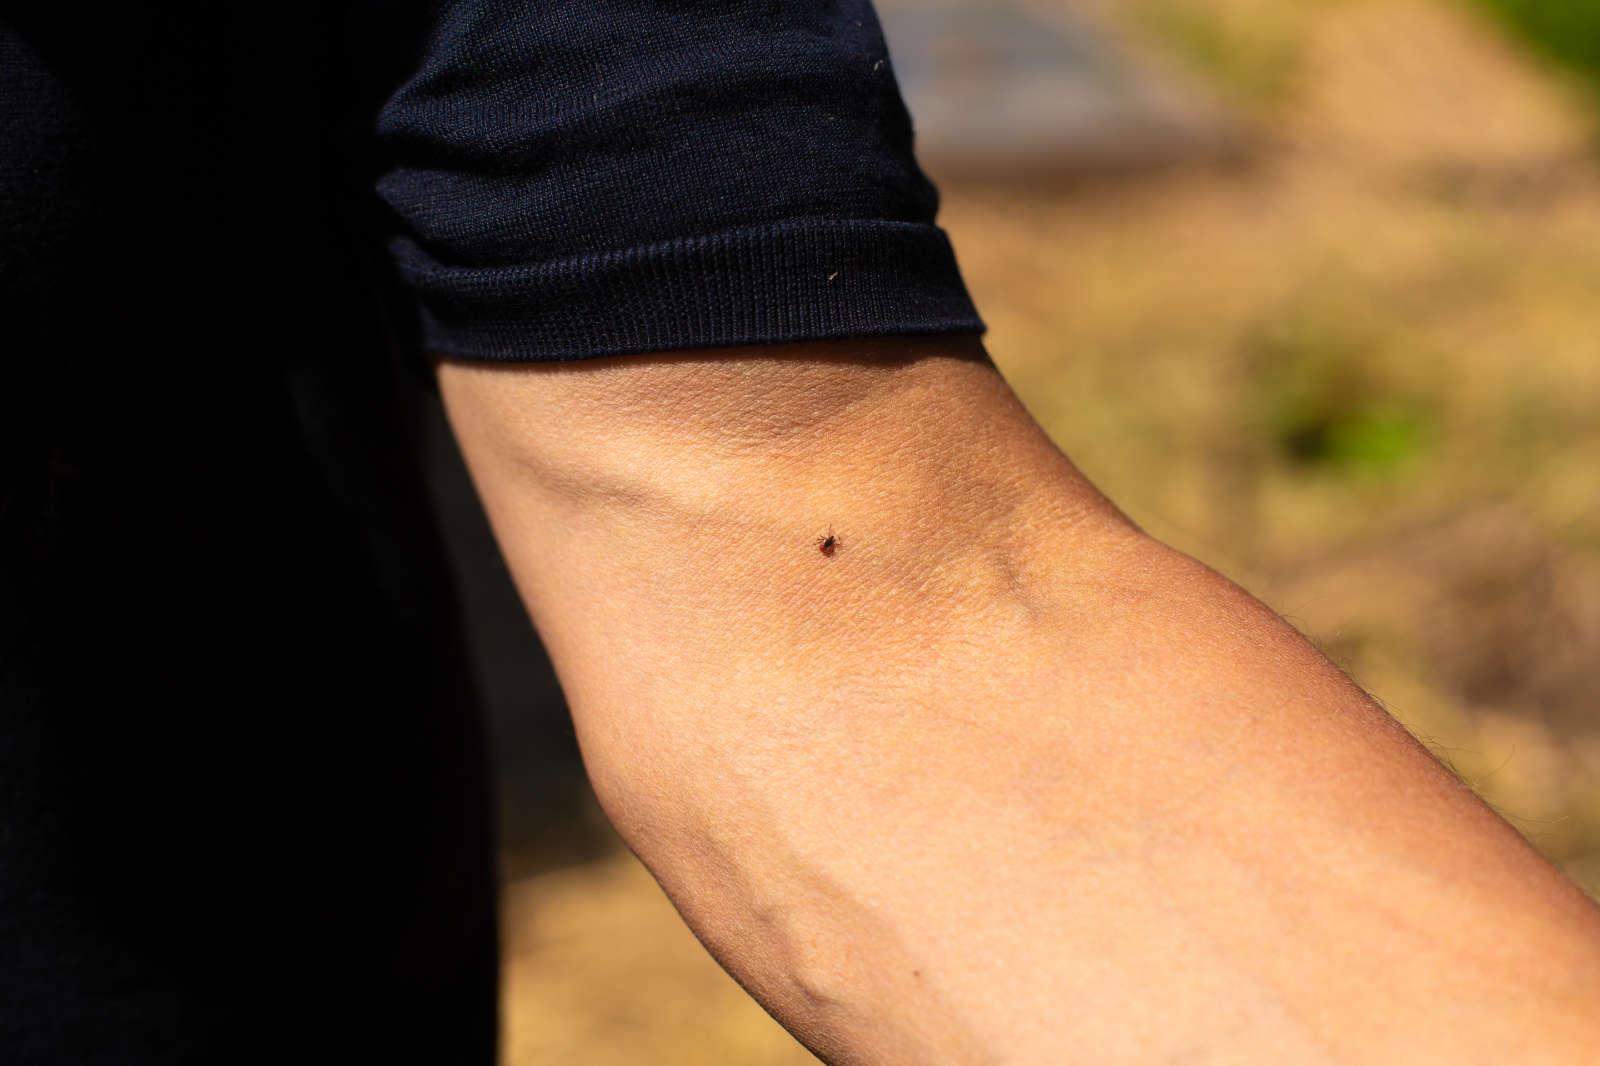 A kullancs sokszor rejtve marad a testhajlatokban